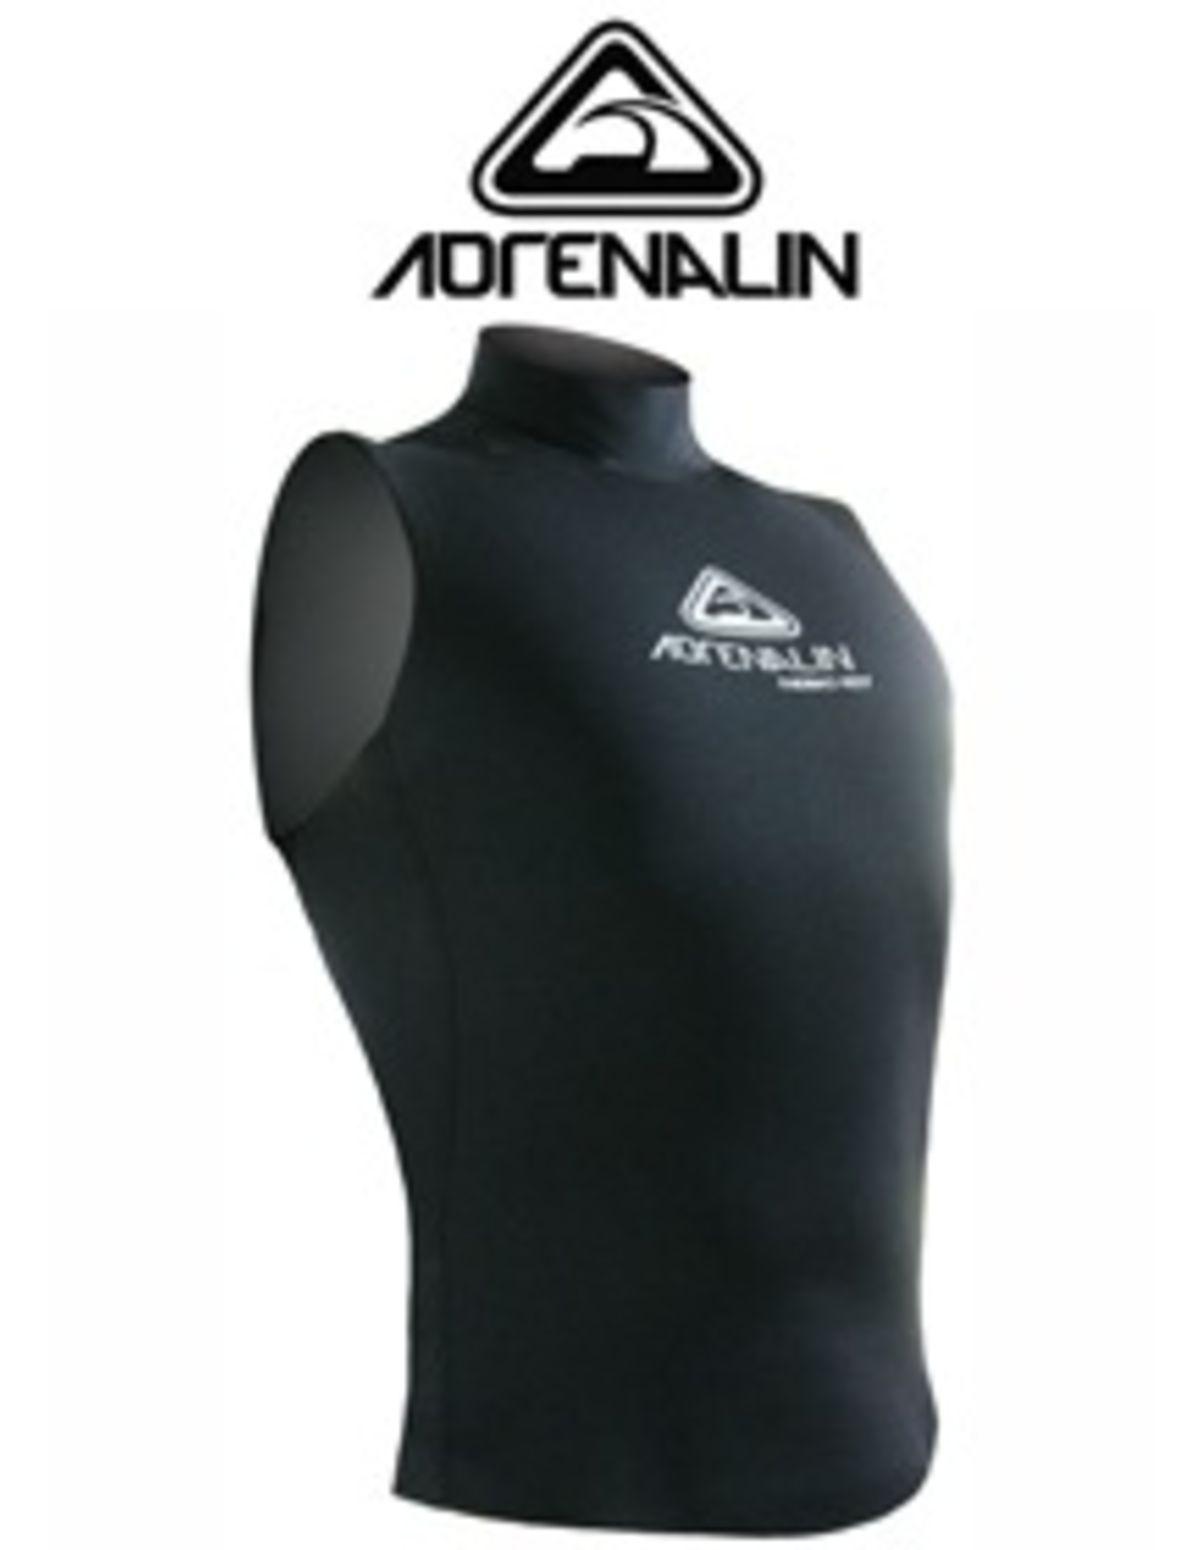 Adrenalin Tank Top